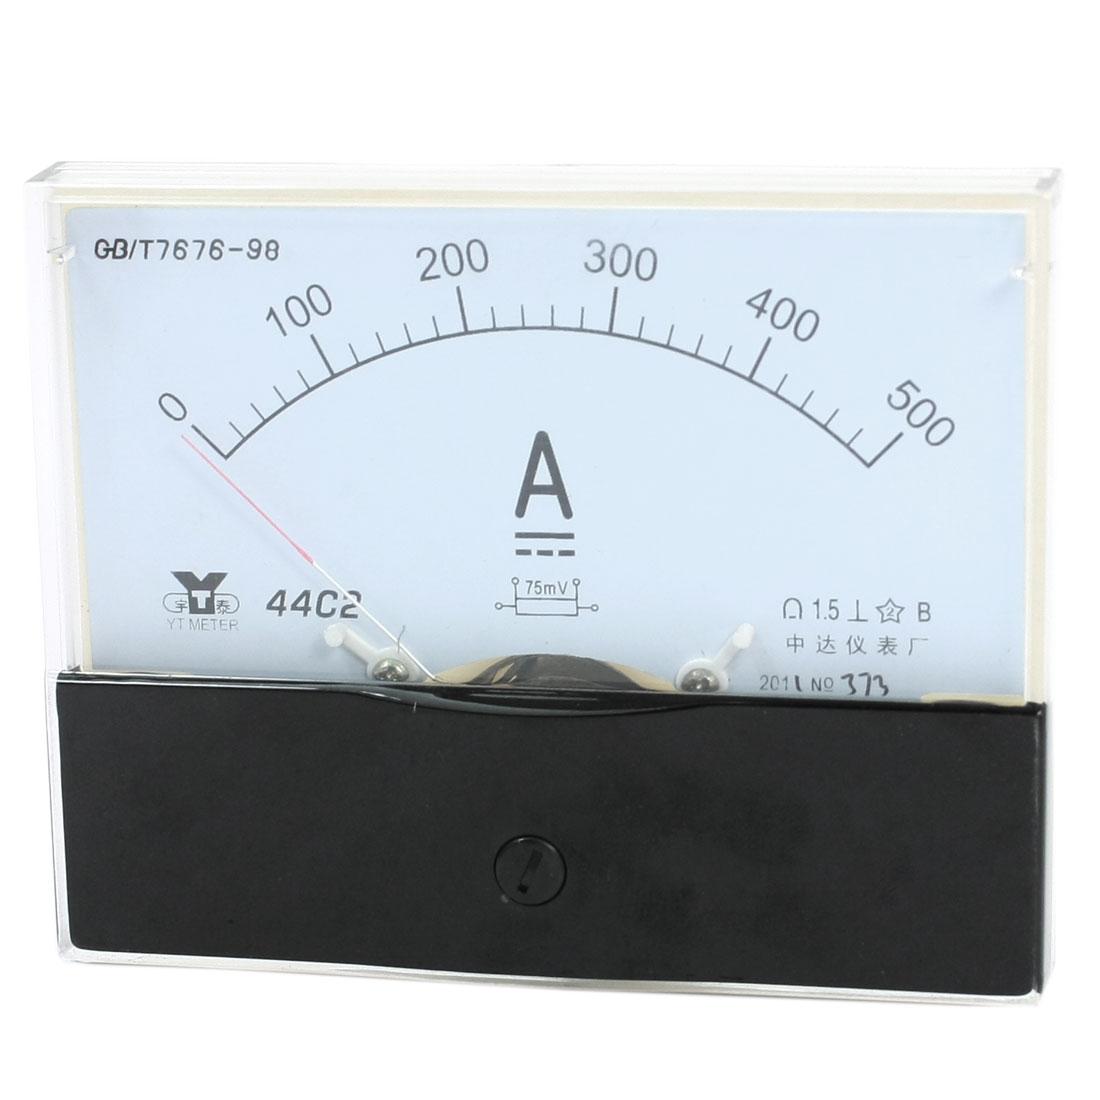 Rectangle Measurement Tool Analog Panel Ammeter Gauge DC 0 - 500A Measuring Range 44C2